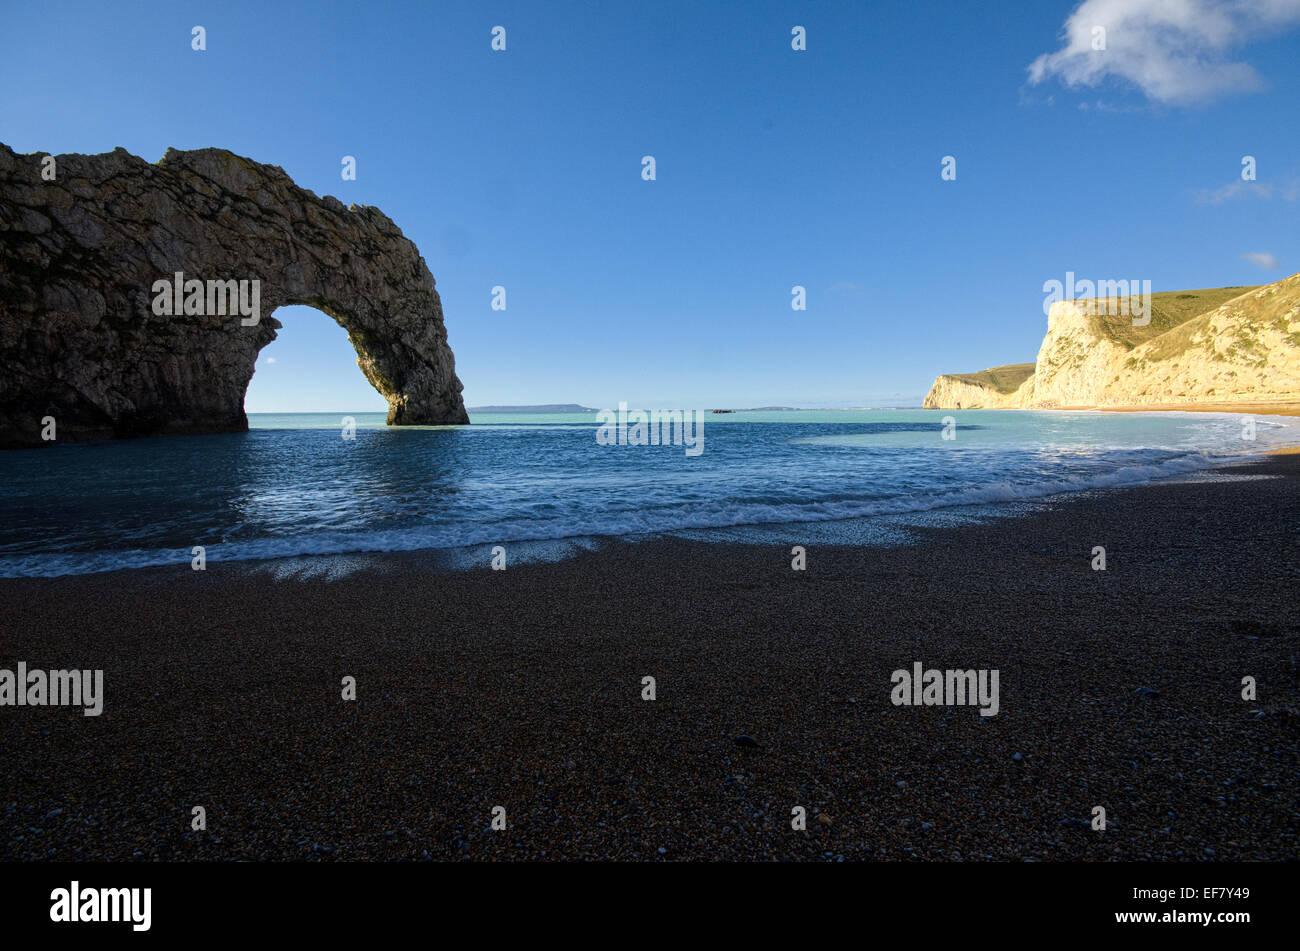 durdle door  jurassic coast  dorset stock photo  royalty free image  78236265